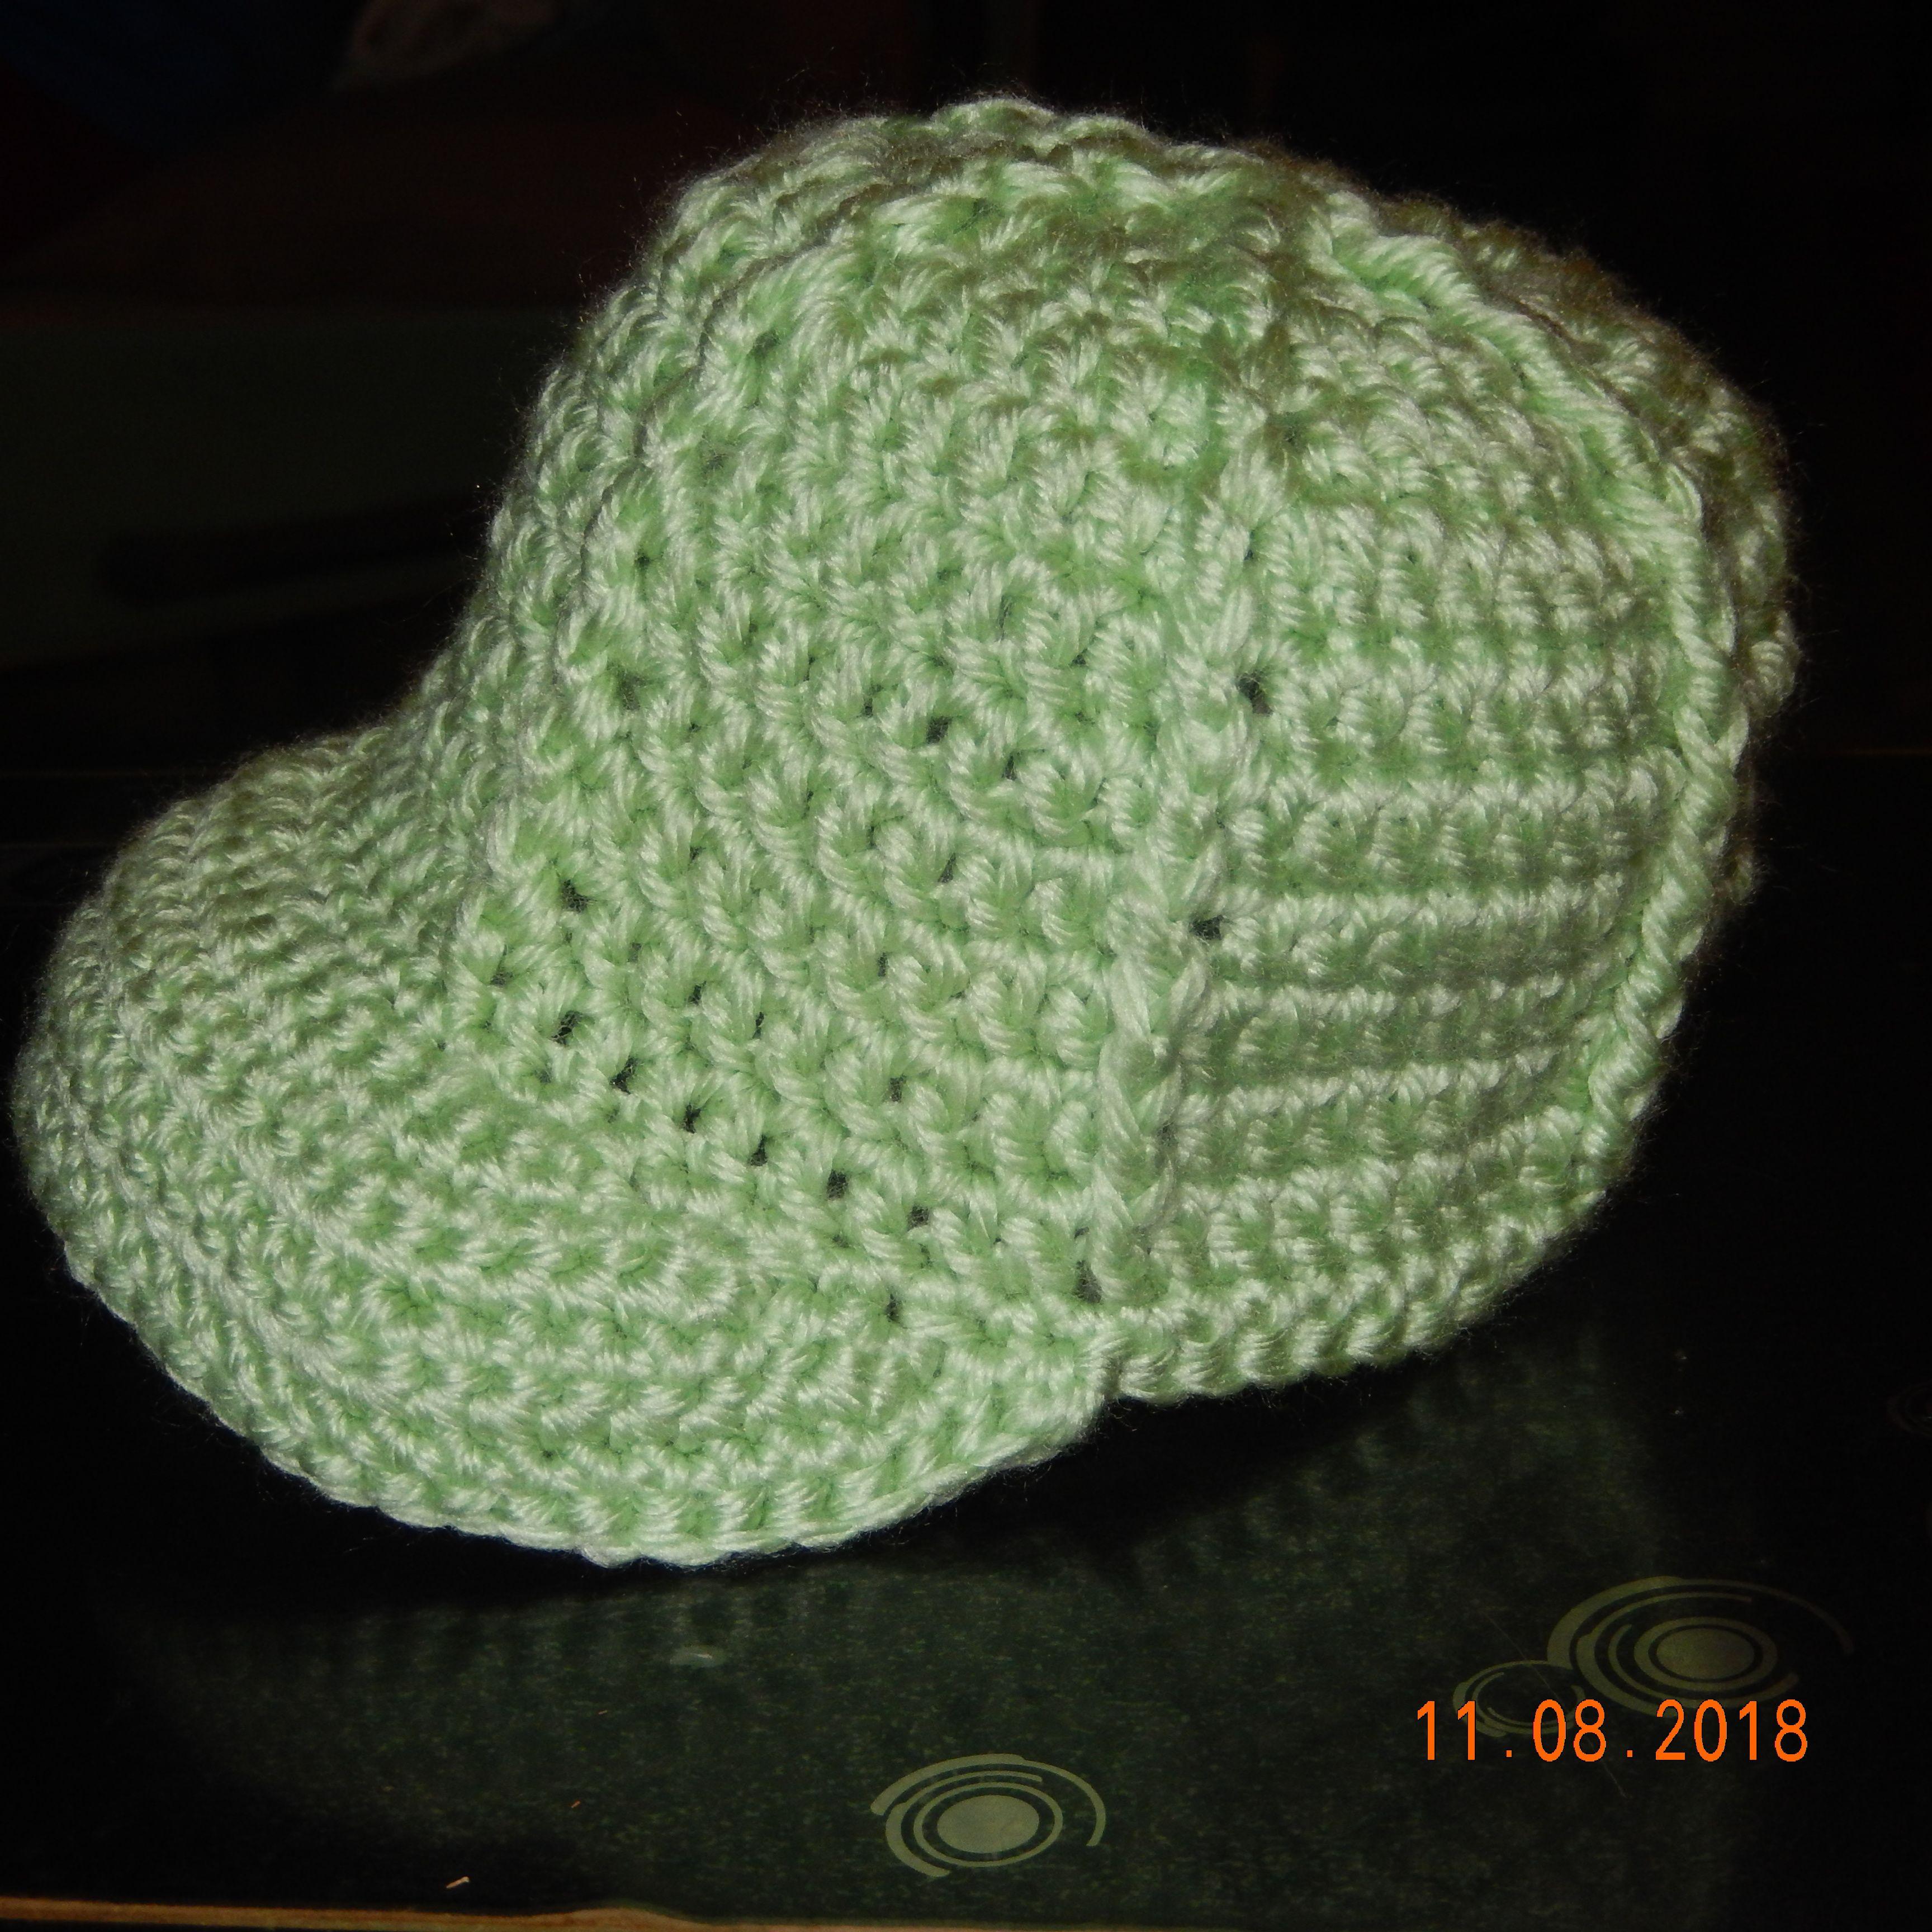 Baby Baseball Cap Made By Toni Willis 11 2018 Pattern By Crochetville Newborn Ballcap Pattern On Ravelry Crochet Baseball Hat Crochet Crochet Baby